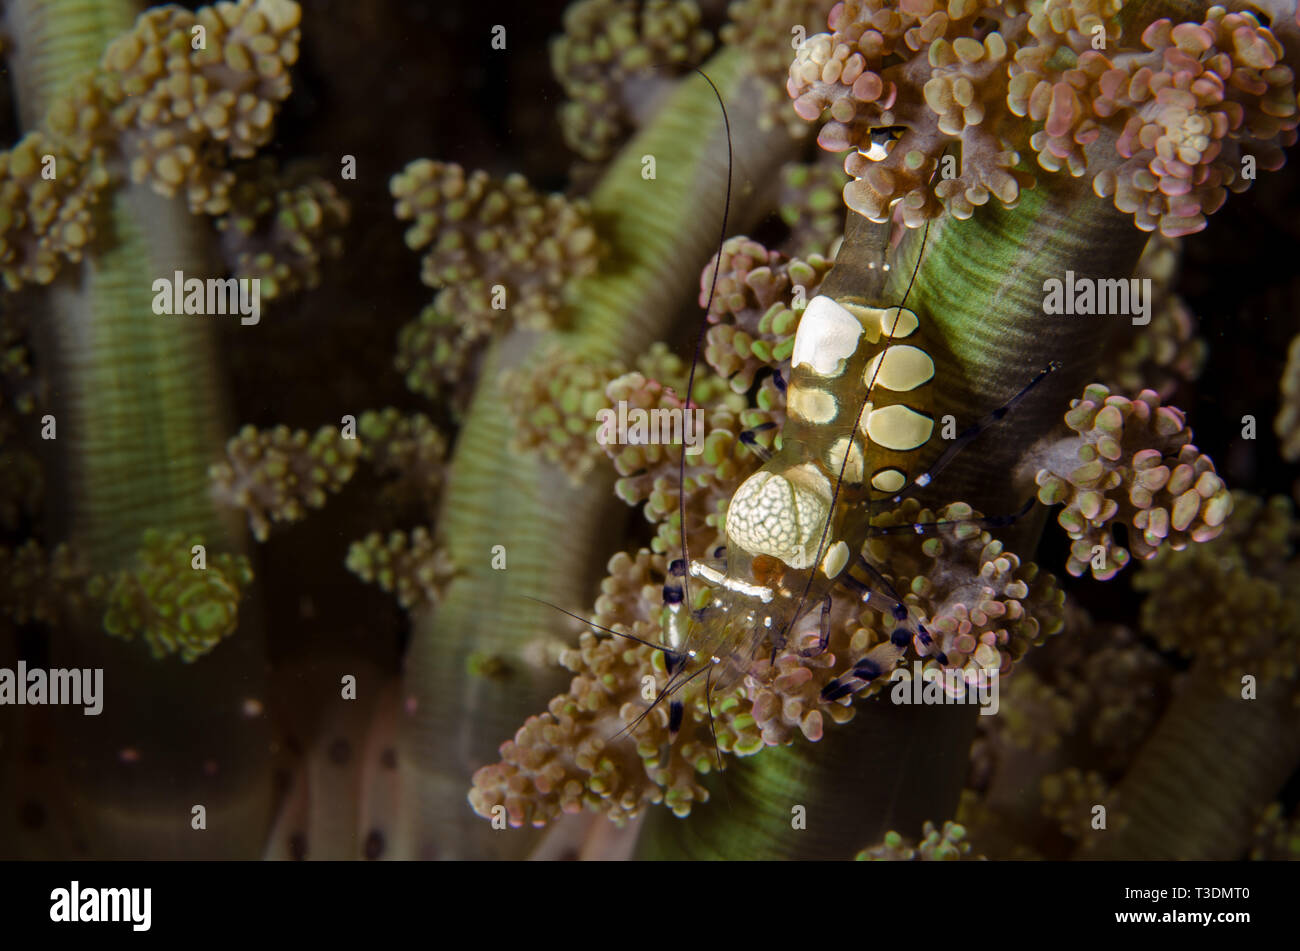 Sarasvati Anemone Shrimp, Periclemenes sarasvati, Palaemonidae, Anilao, Batangas, Philippines, Philippine Sea, Pacific Ocean, Asia - Stock Image